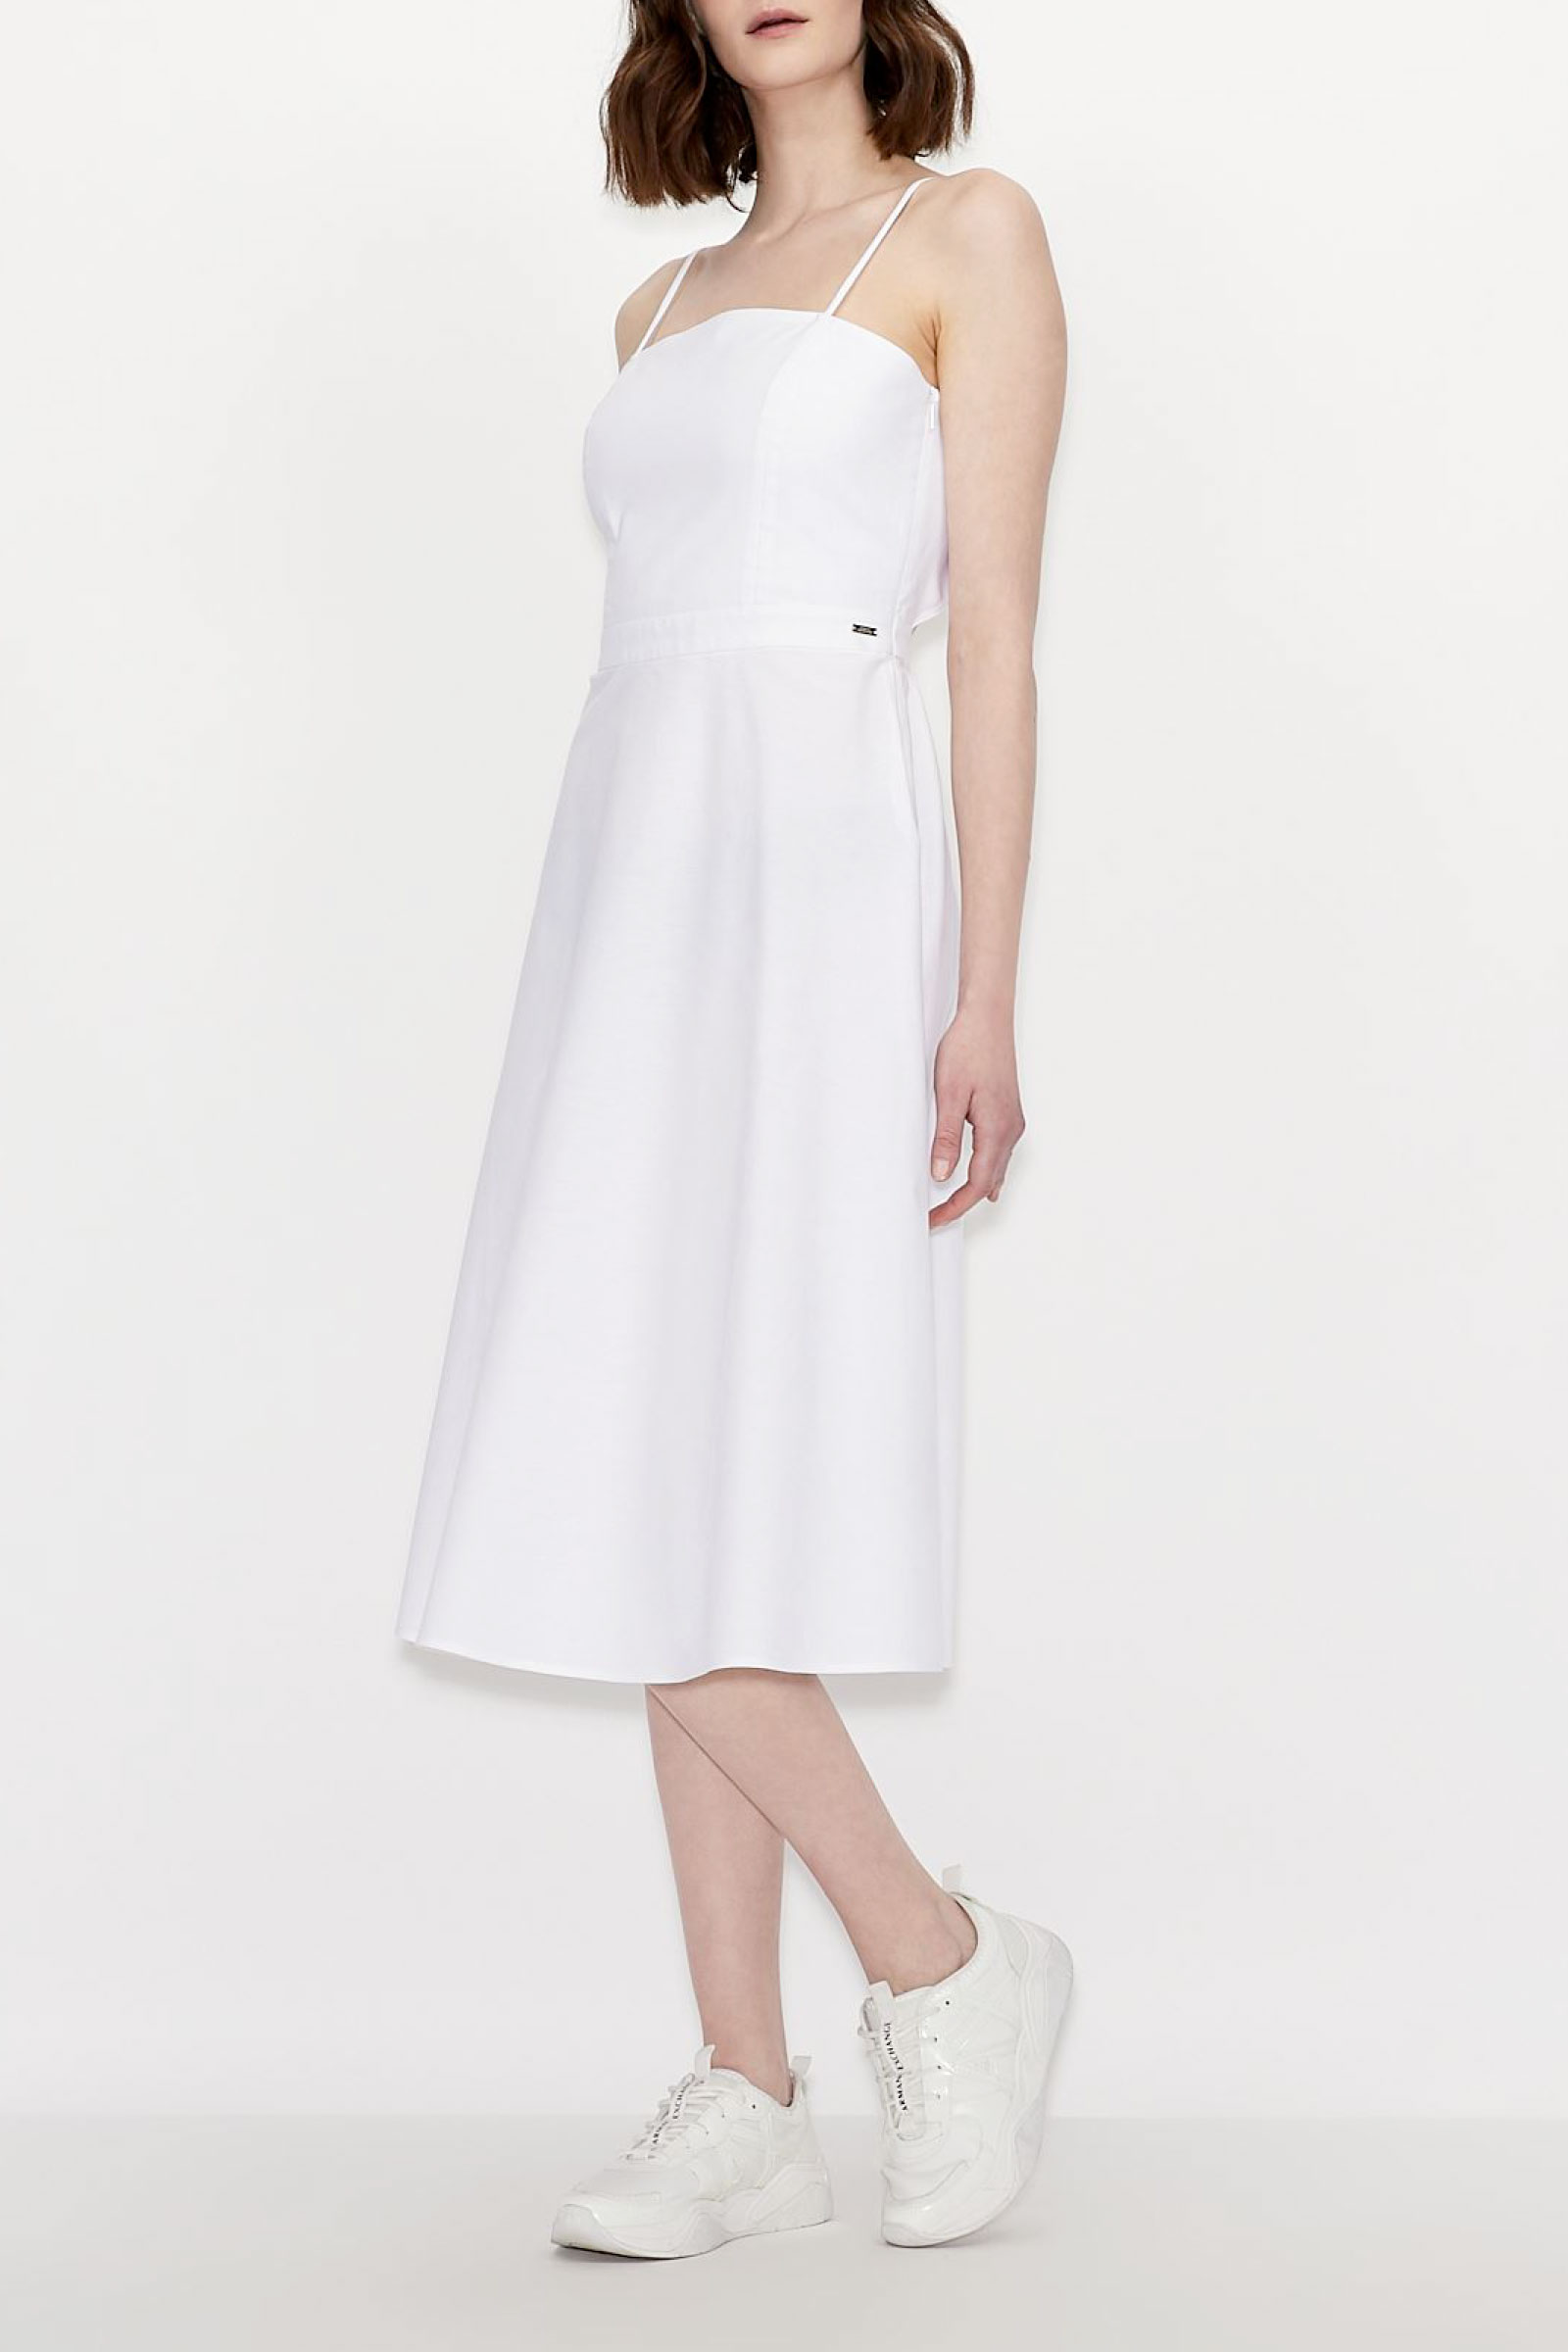 ARMANI EXCHANGE Vestito Donna ARMANI EXCHANGE | Vestito | 3KYA27 YNVFZ1100